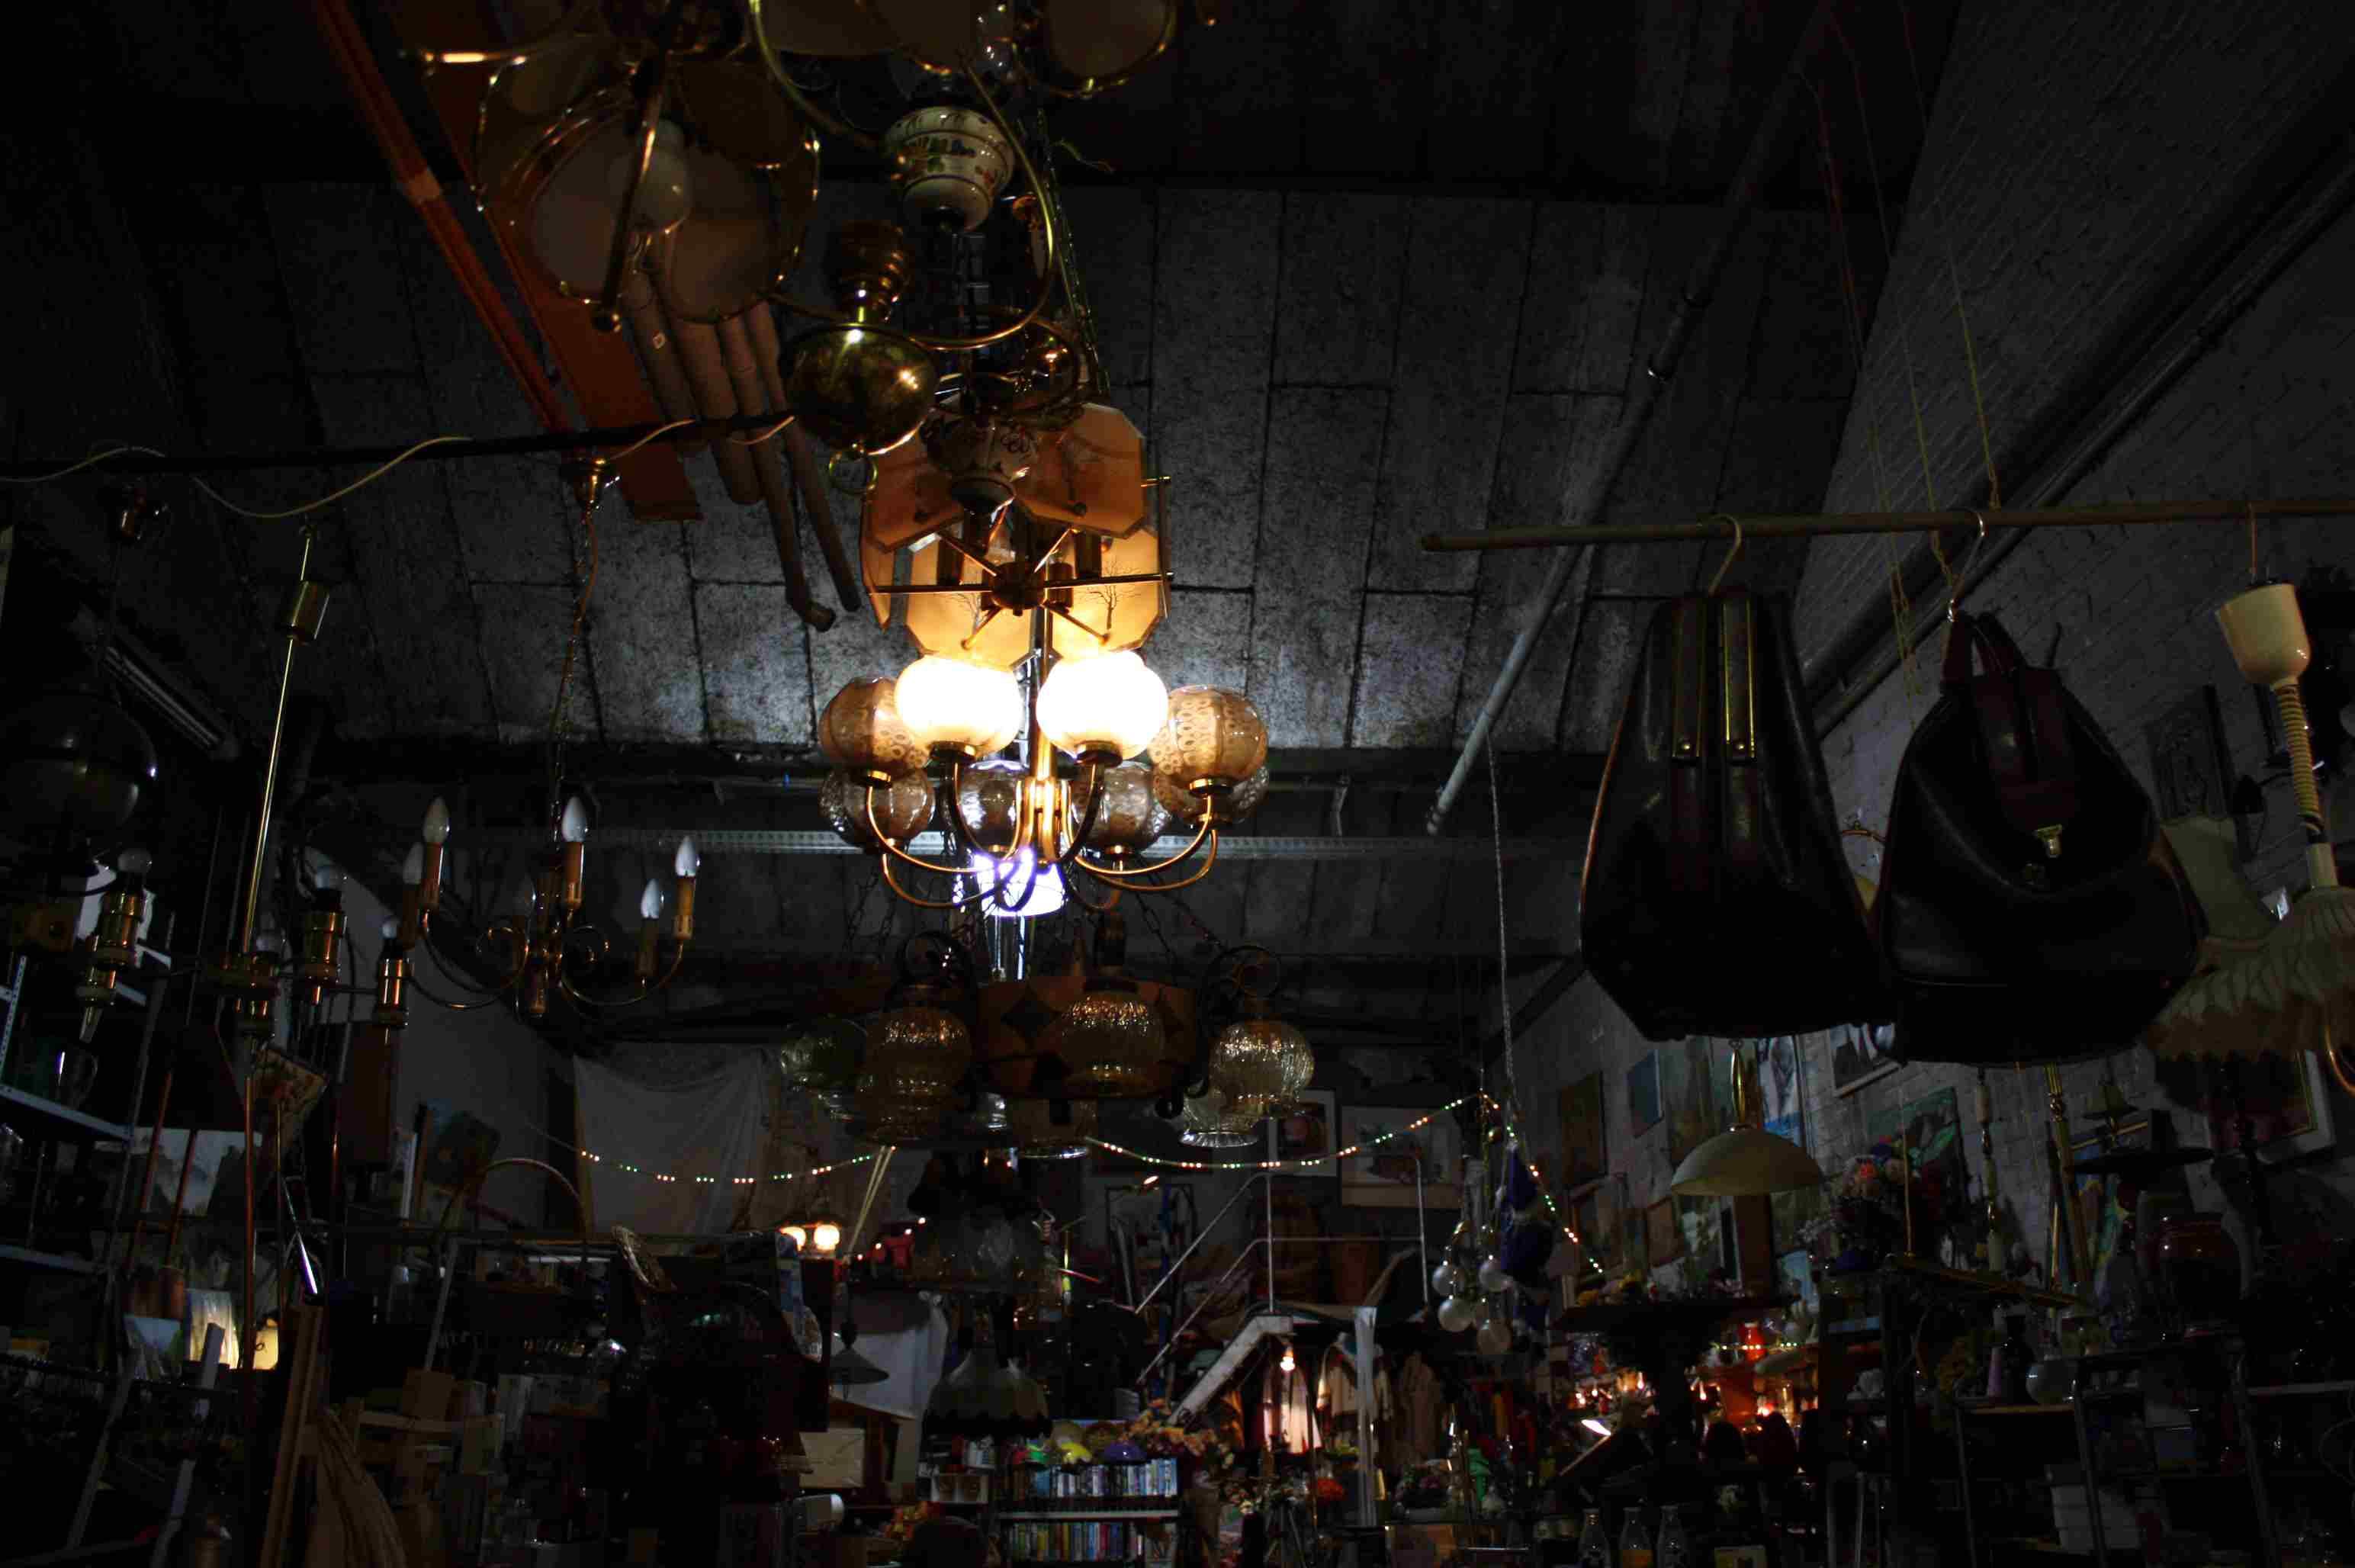 Treptow Flohmarkt